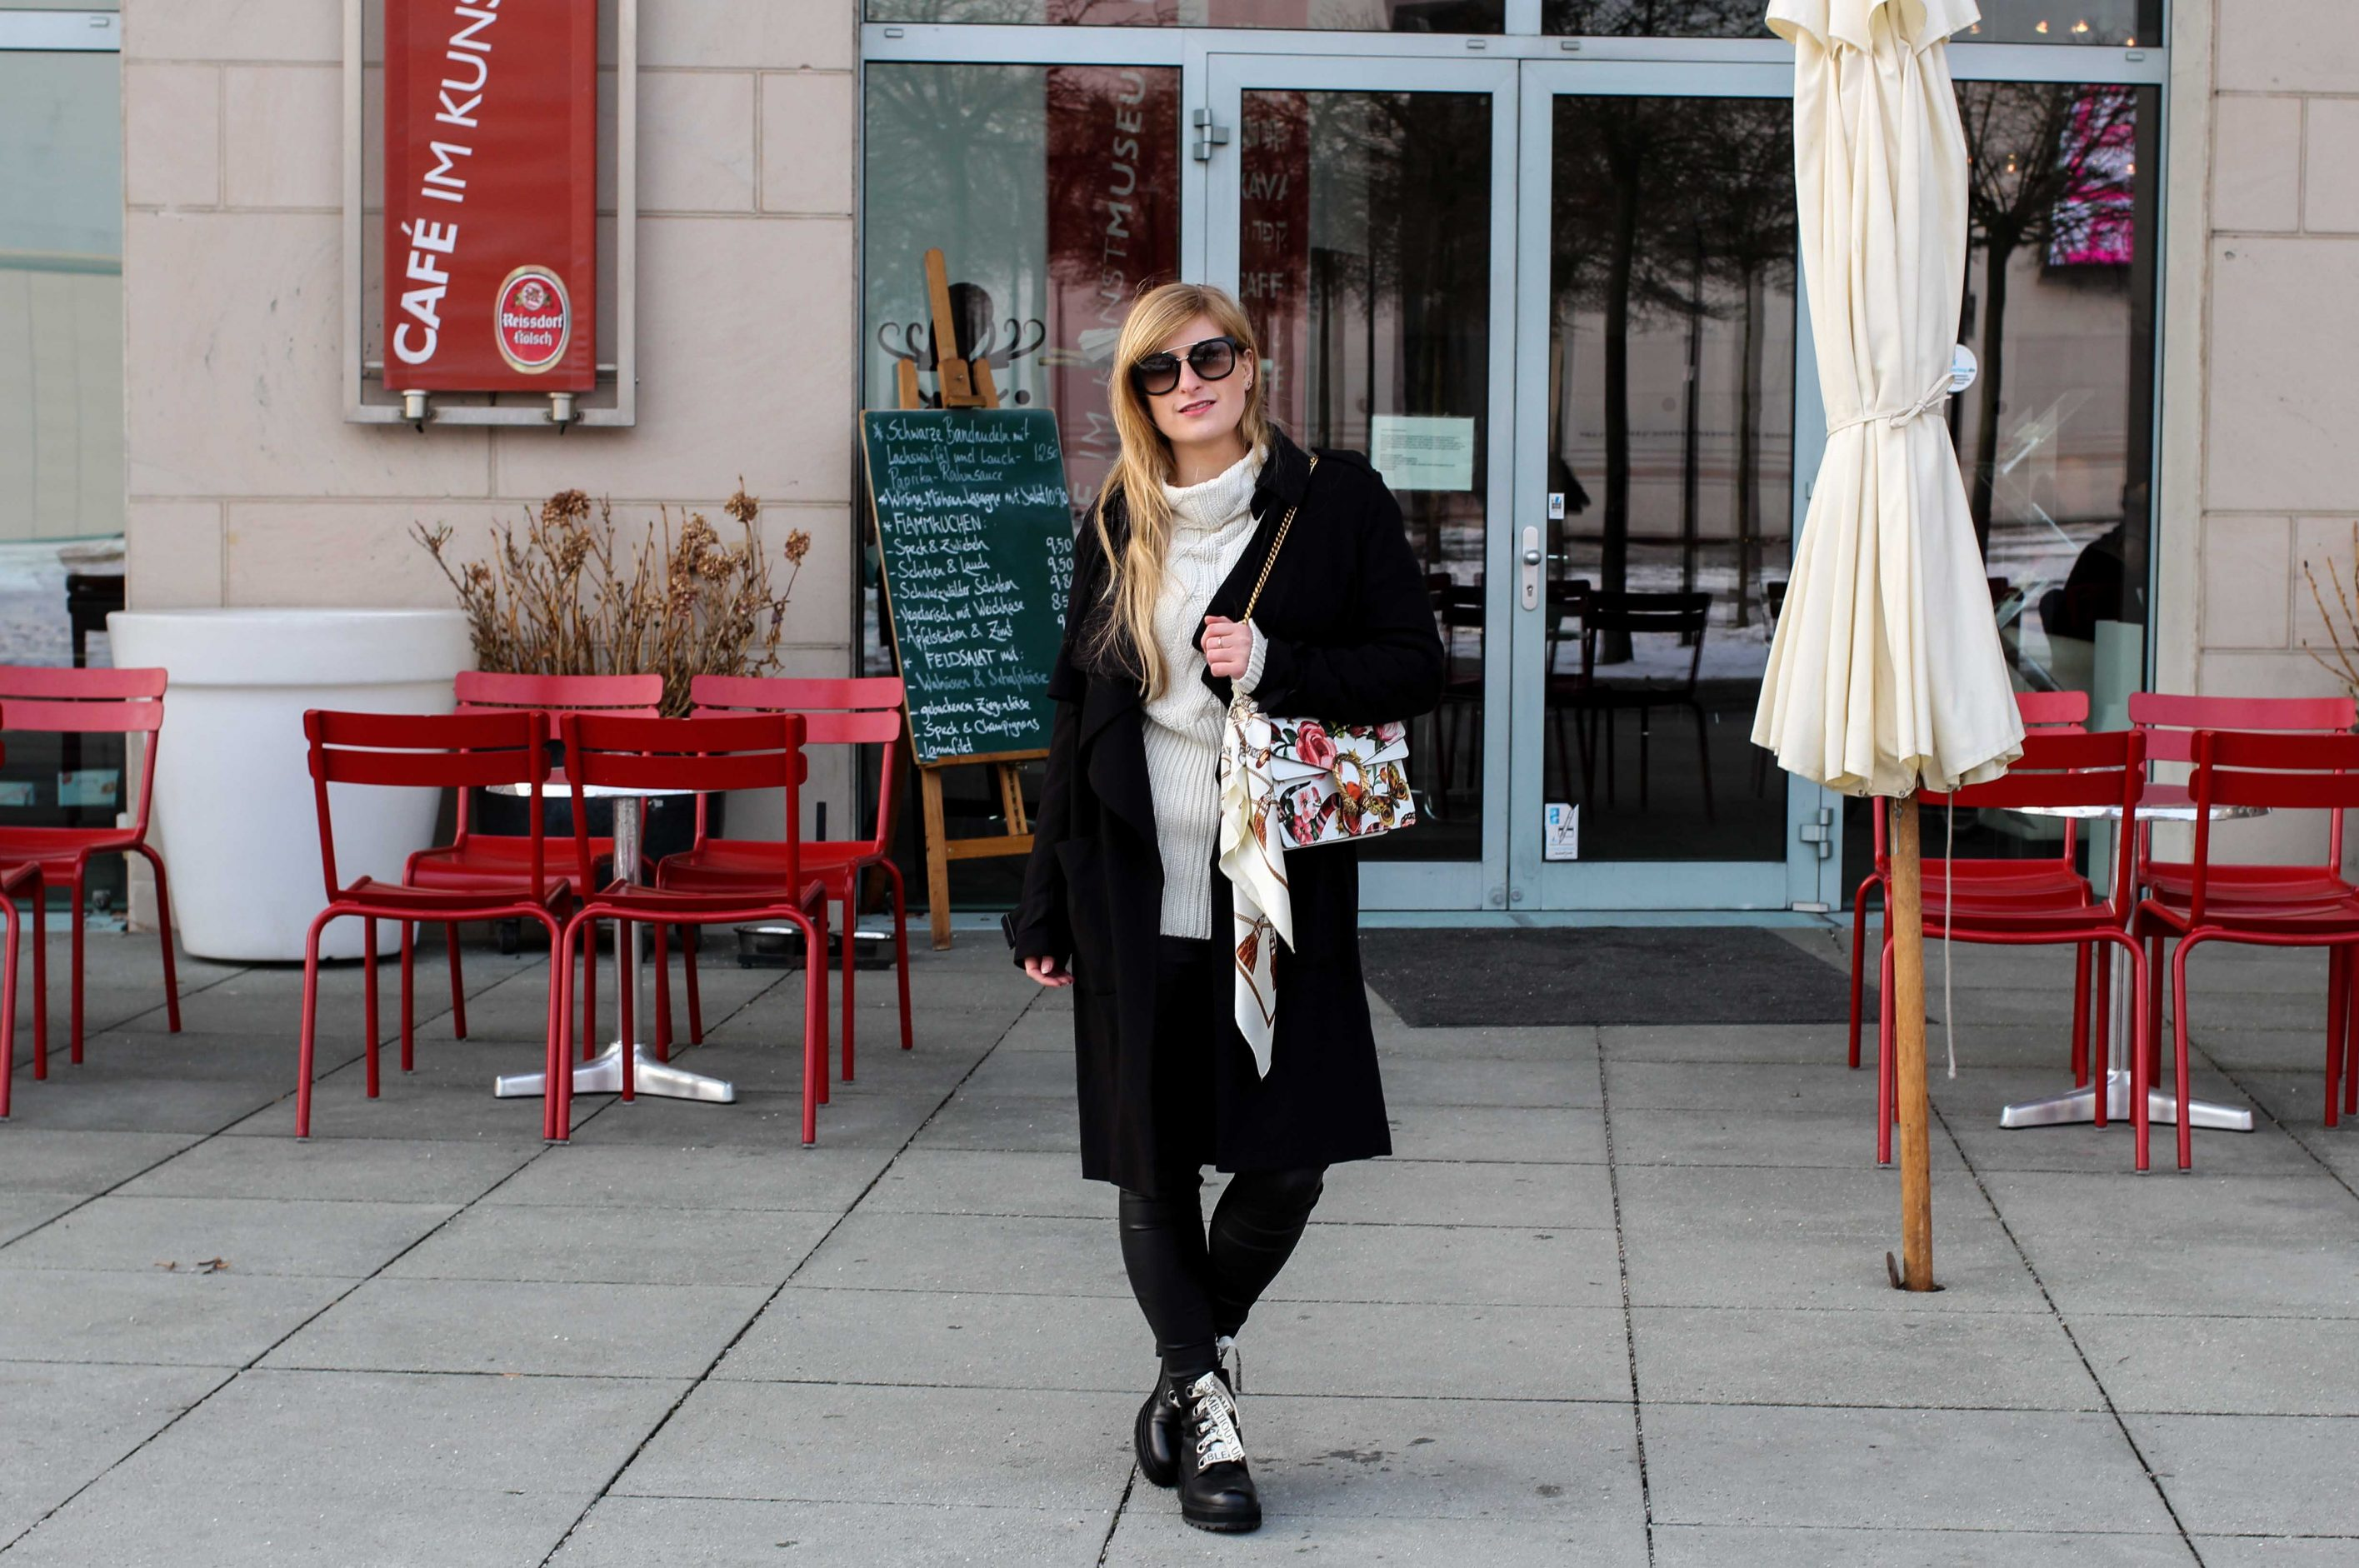 Schnürboots Zara Schnürsenkel Gucci Dionysus Garden Print Frühlingslook kältere Tage schwarze Lederleggins Modeblogger Bonn